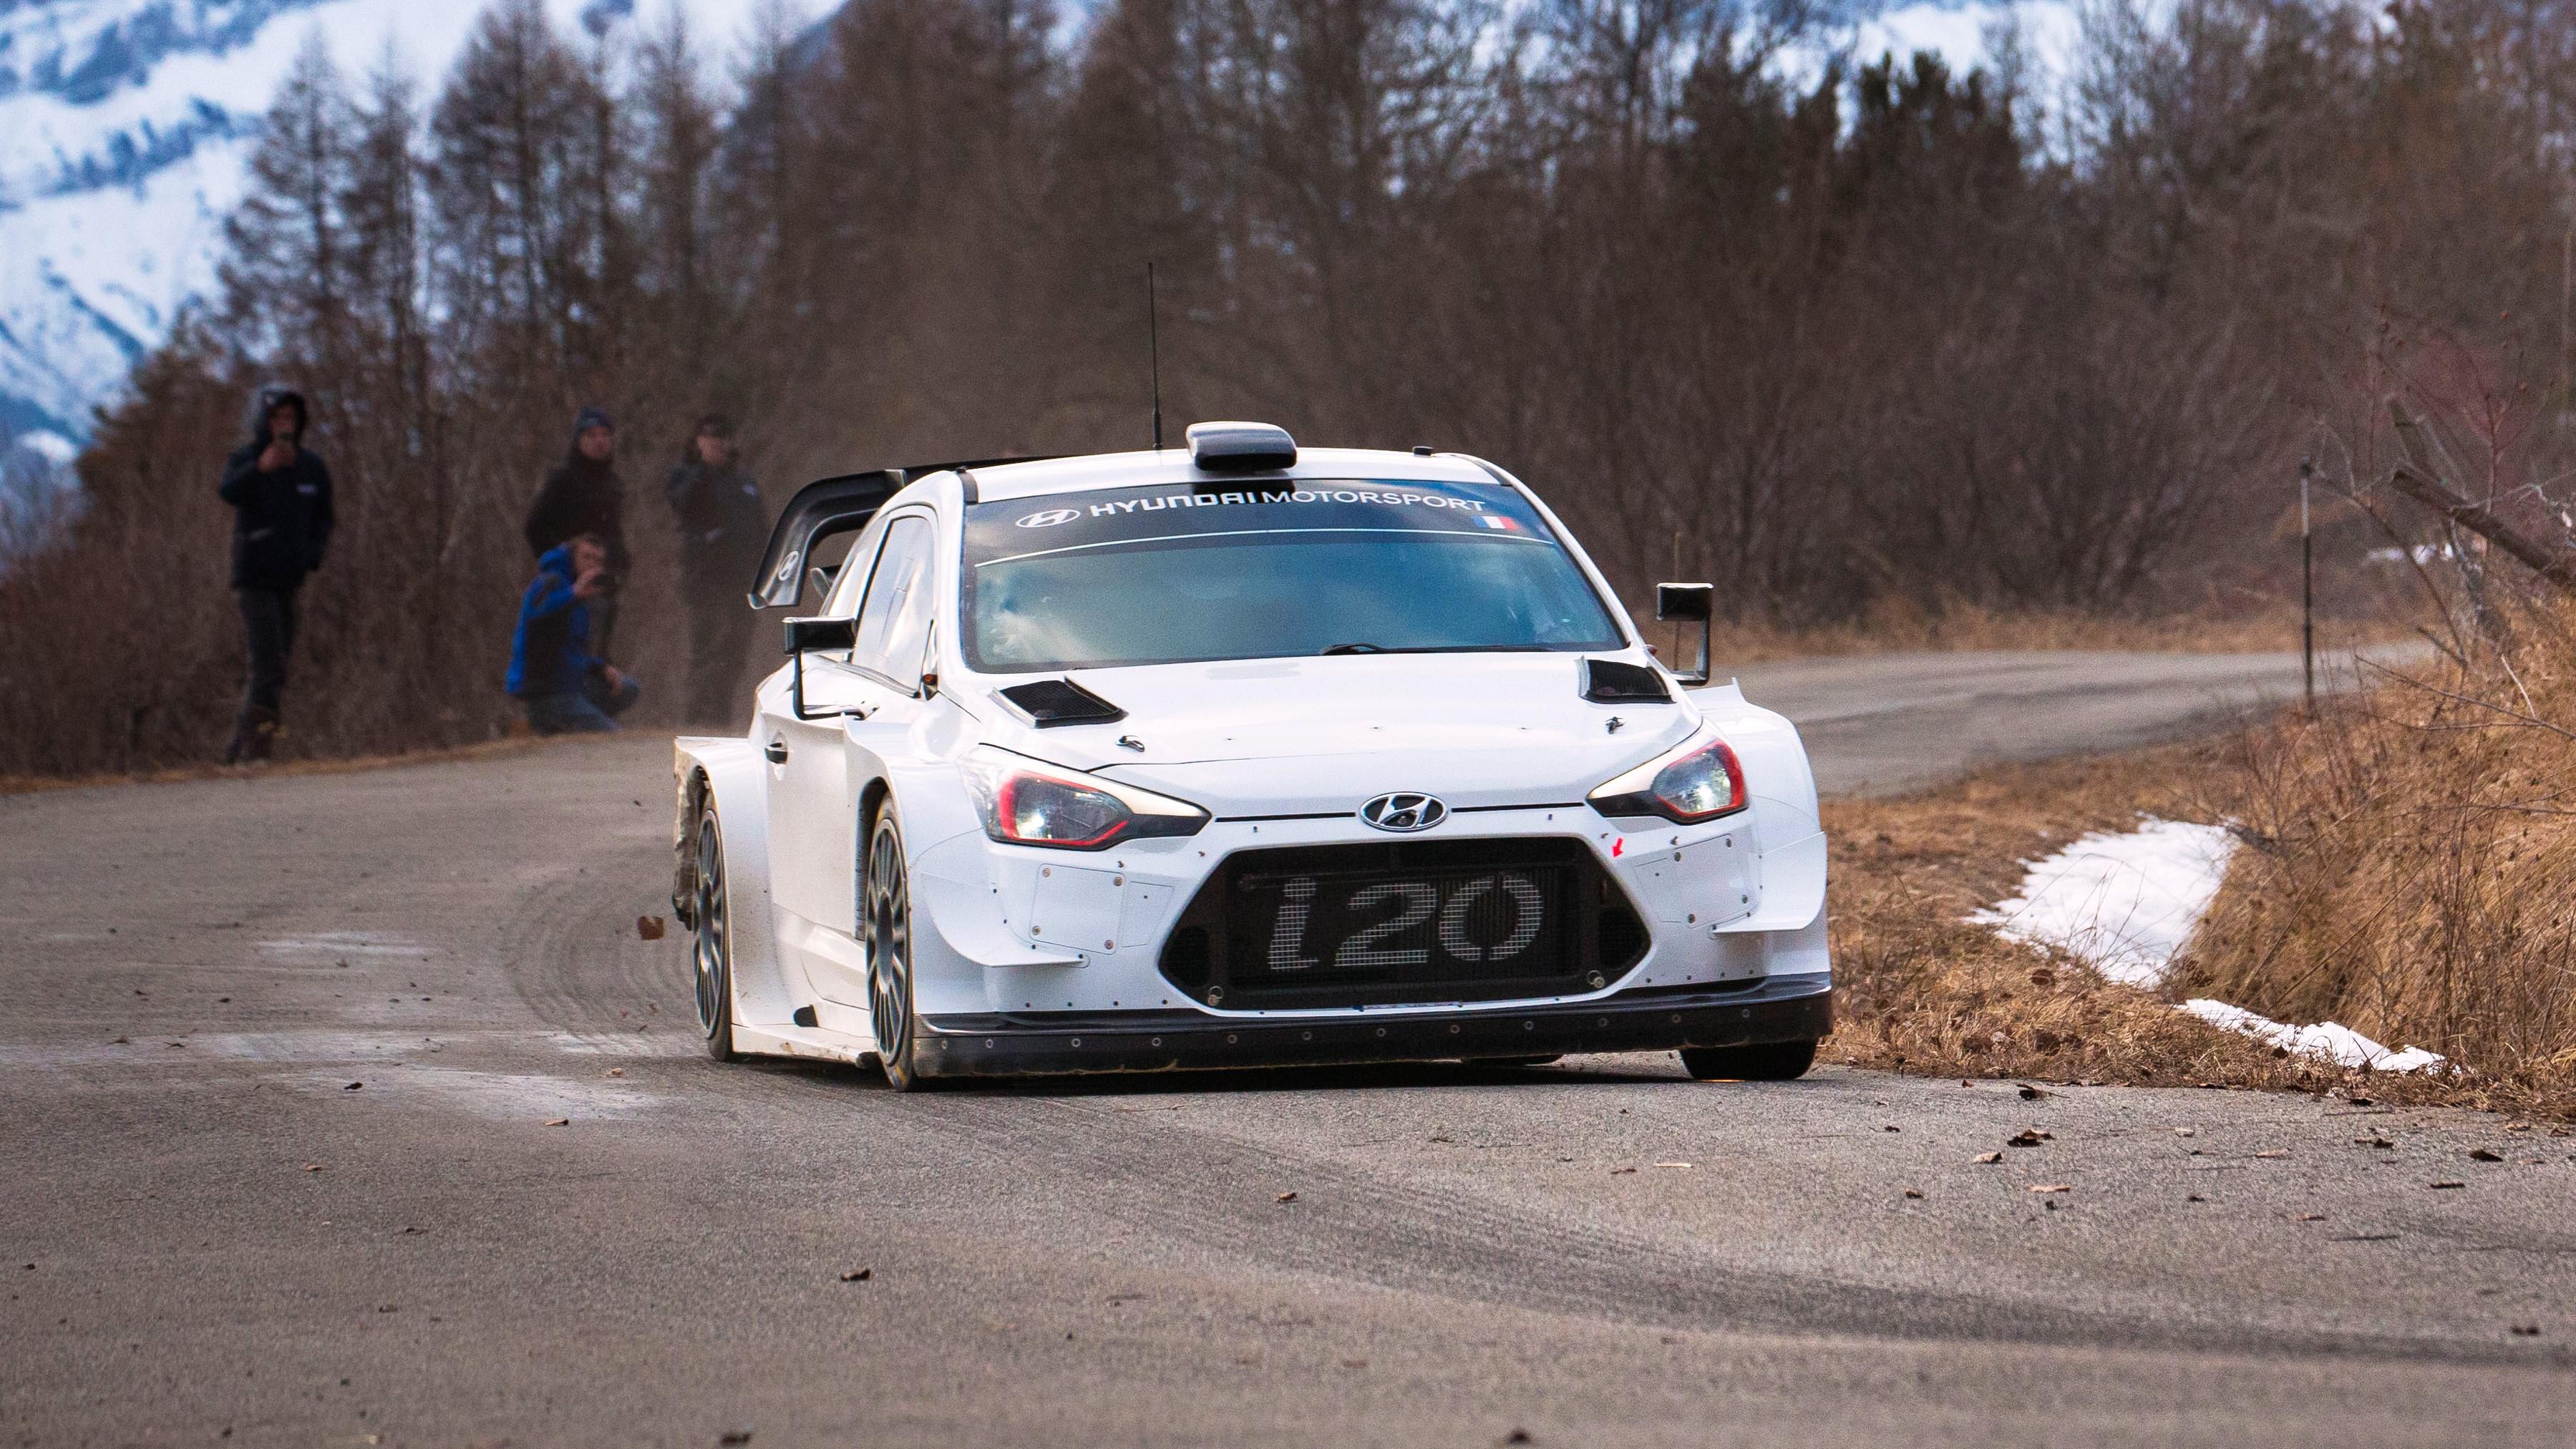 Motorsport: WRC 2019 season preview